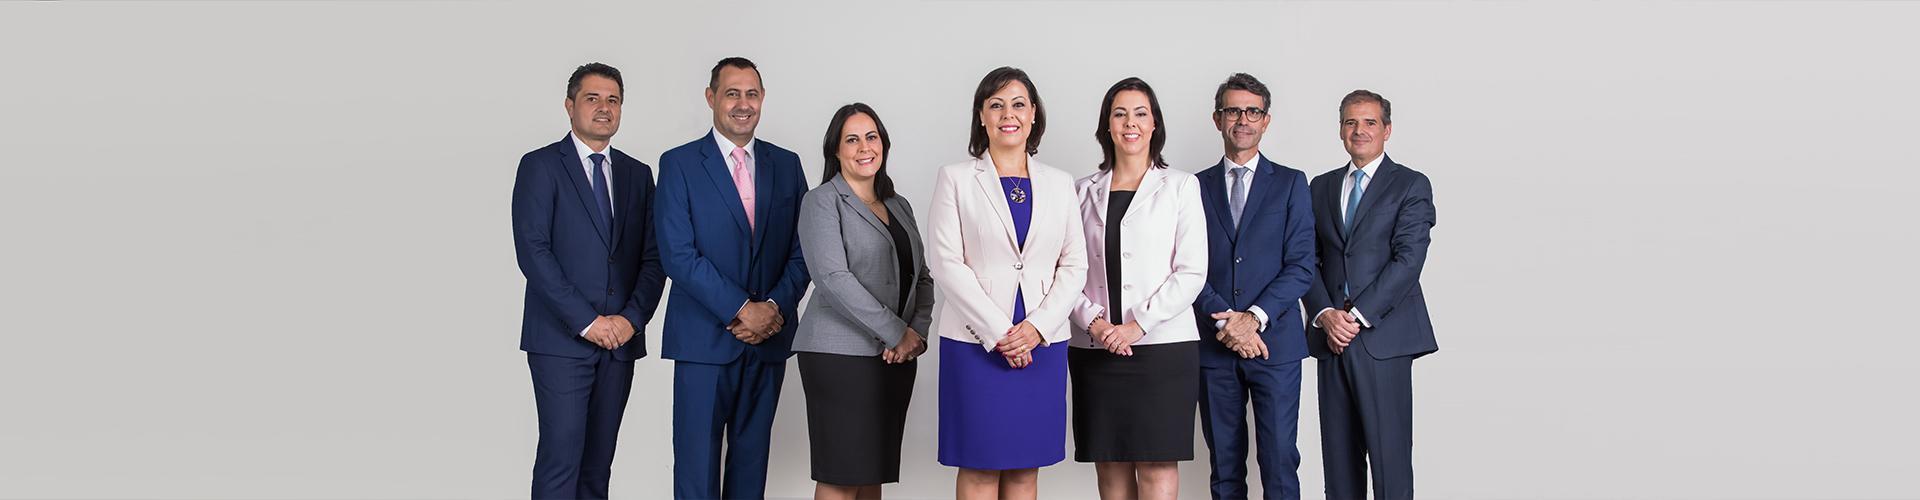 Grupo Fedola consejo de admon 2021 - encabezado seccion